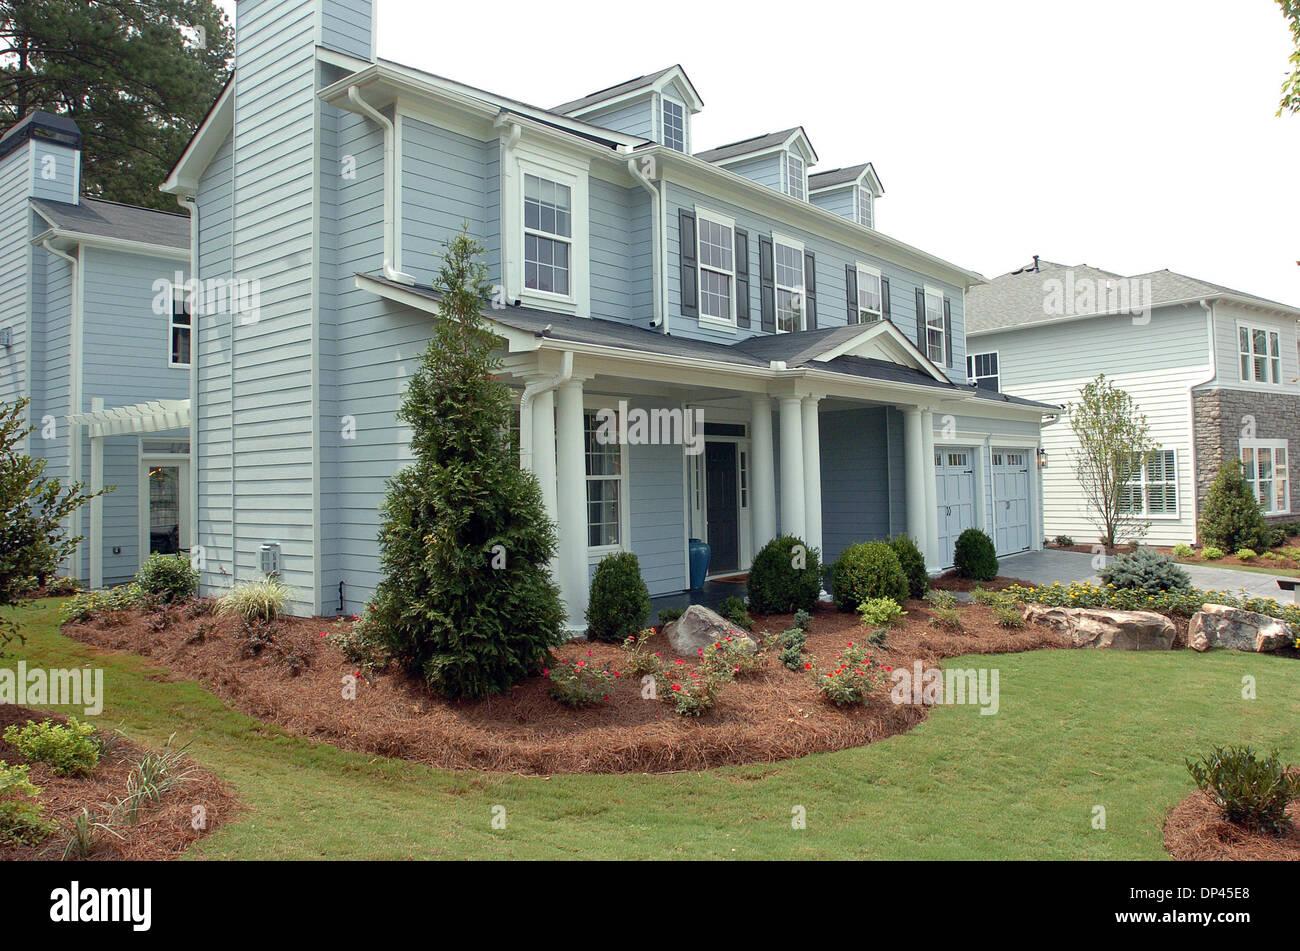 Jul 25, 2006; Fairburn, GA, USA; One of the model homes at the Stock ...